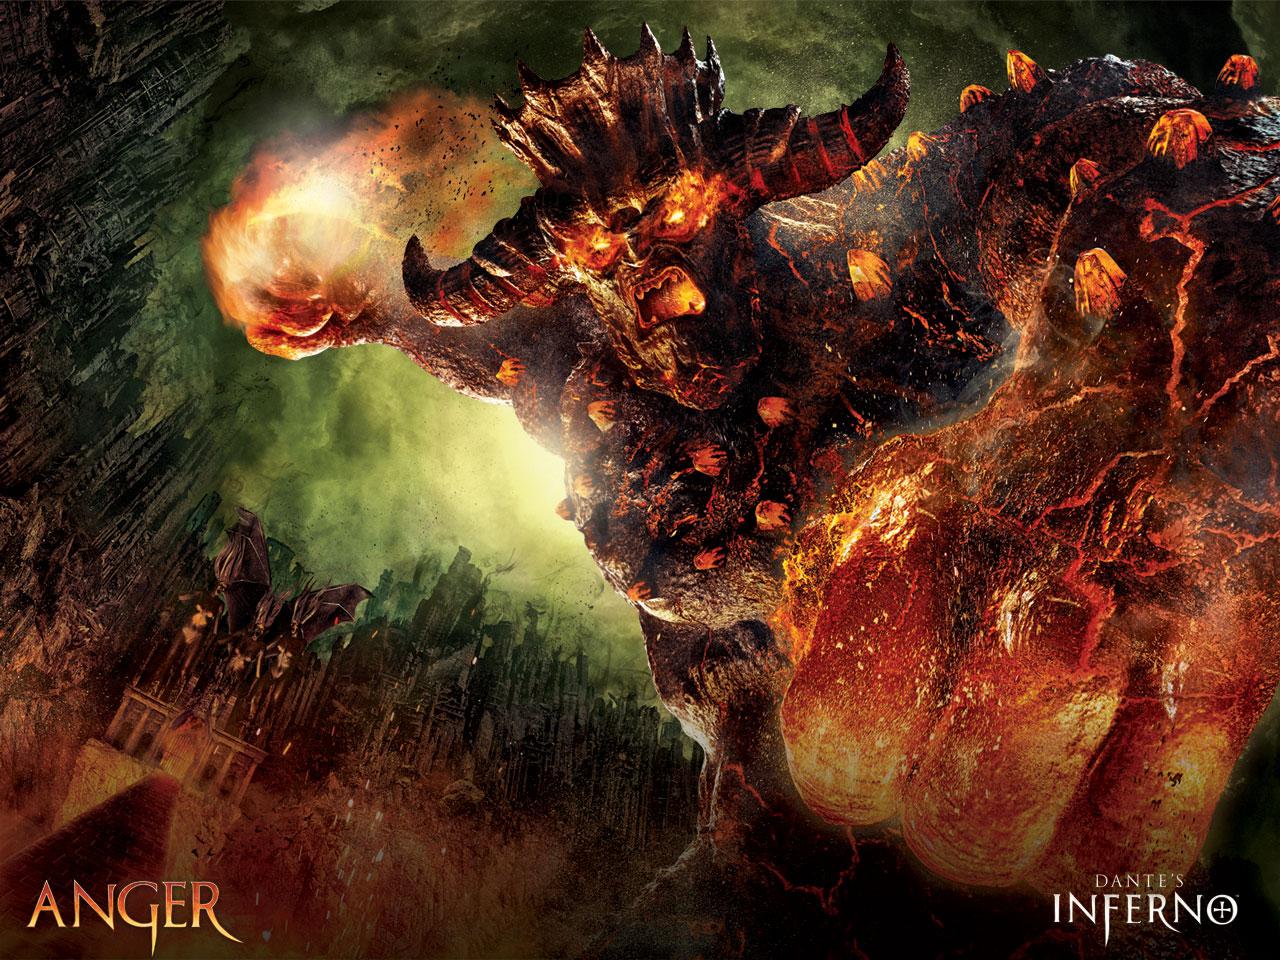 http://www.videogamesblogger.com/wp-content/uploads/2009/12/anger-wallpaper-dantes-inferno-1280x960.jpg